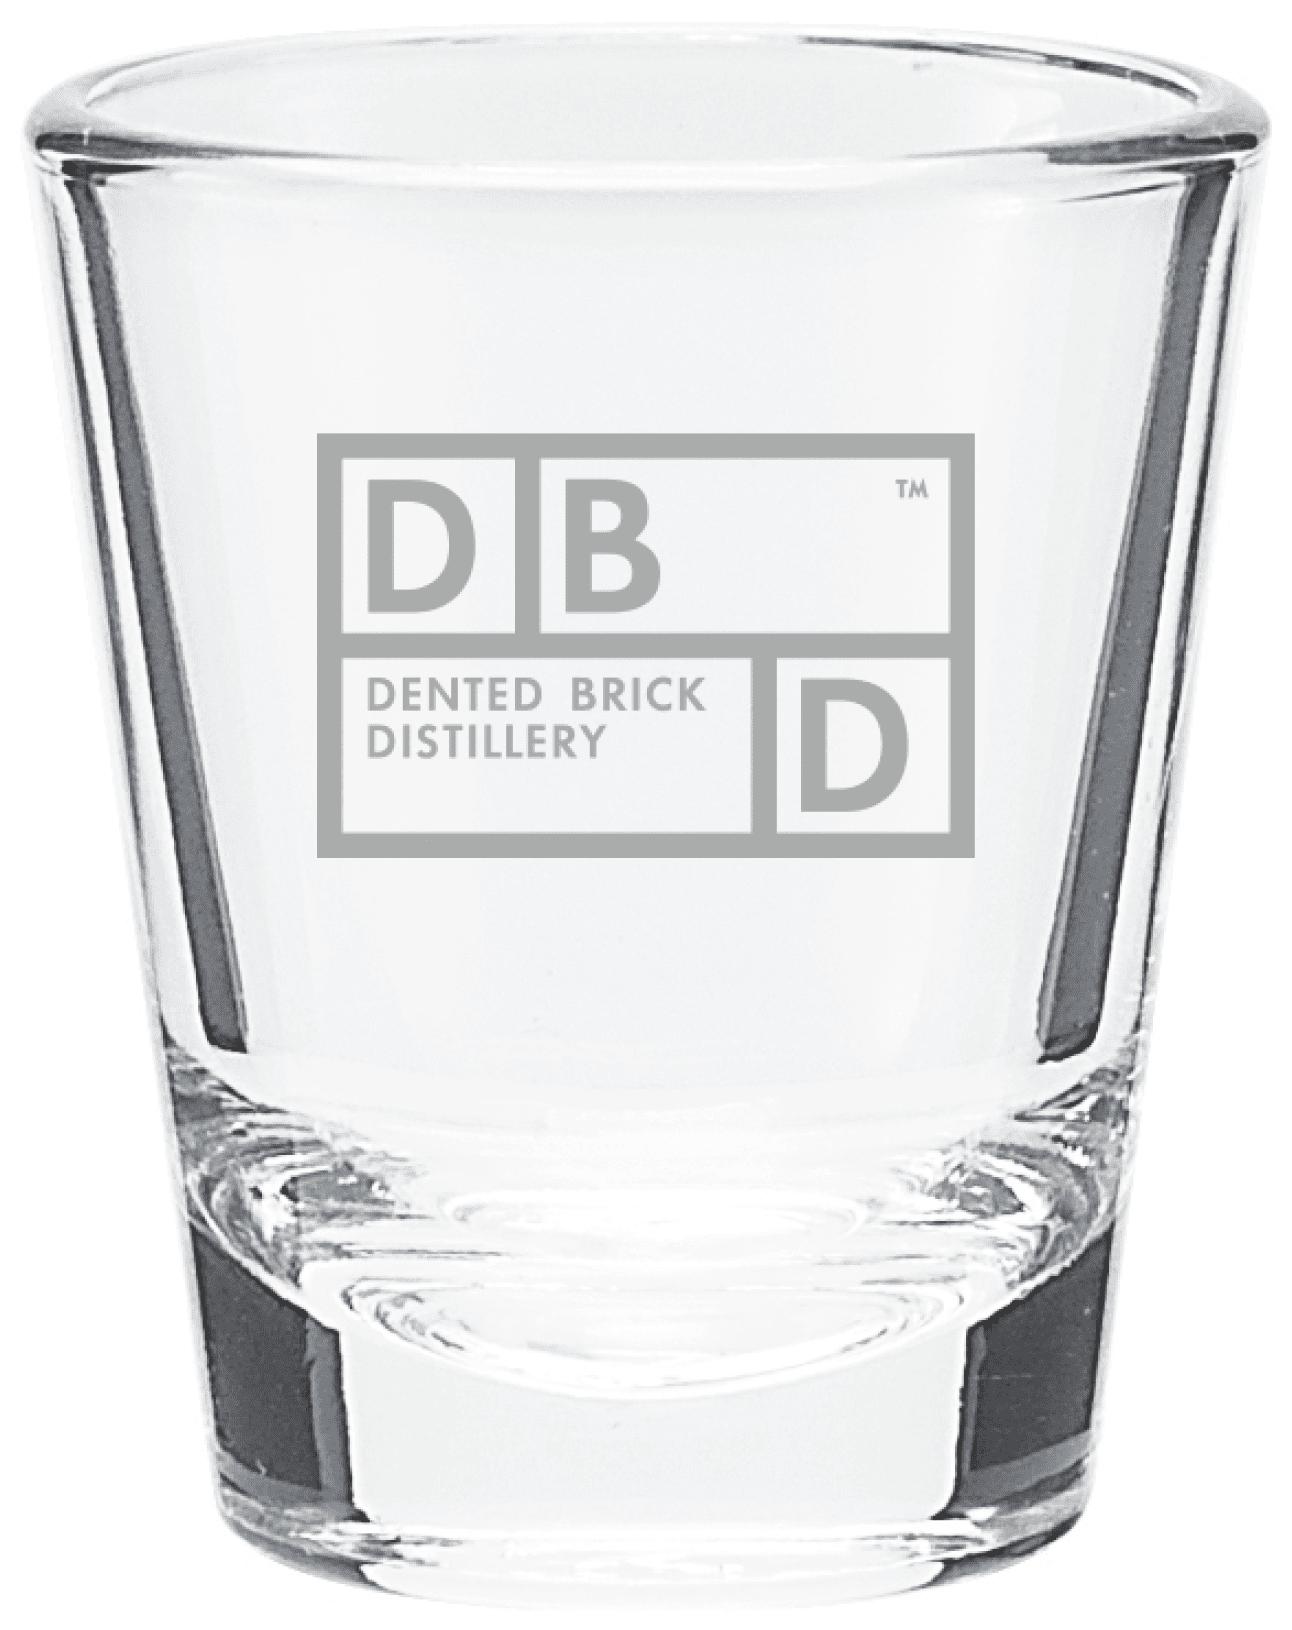 Dented Brick Distillery shot glass